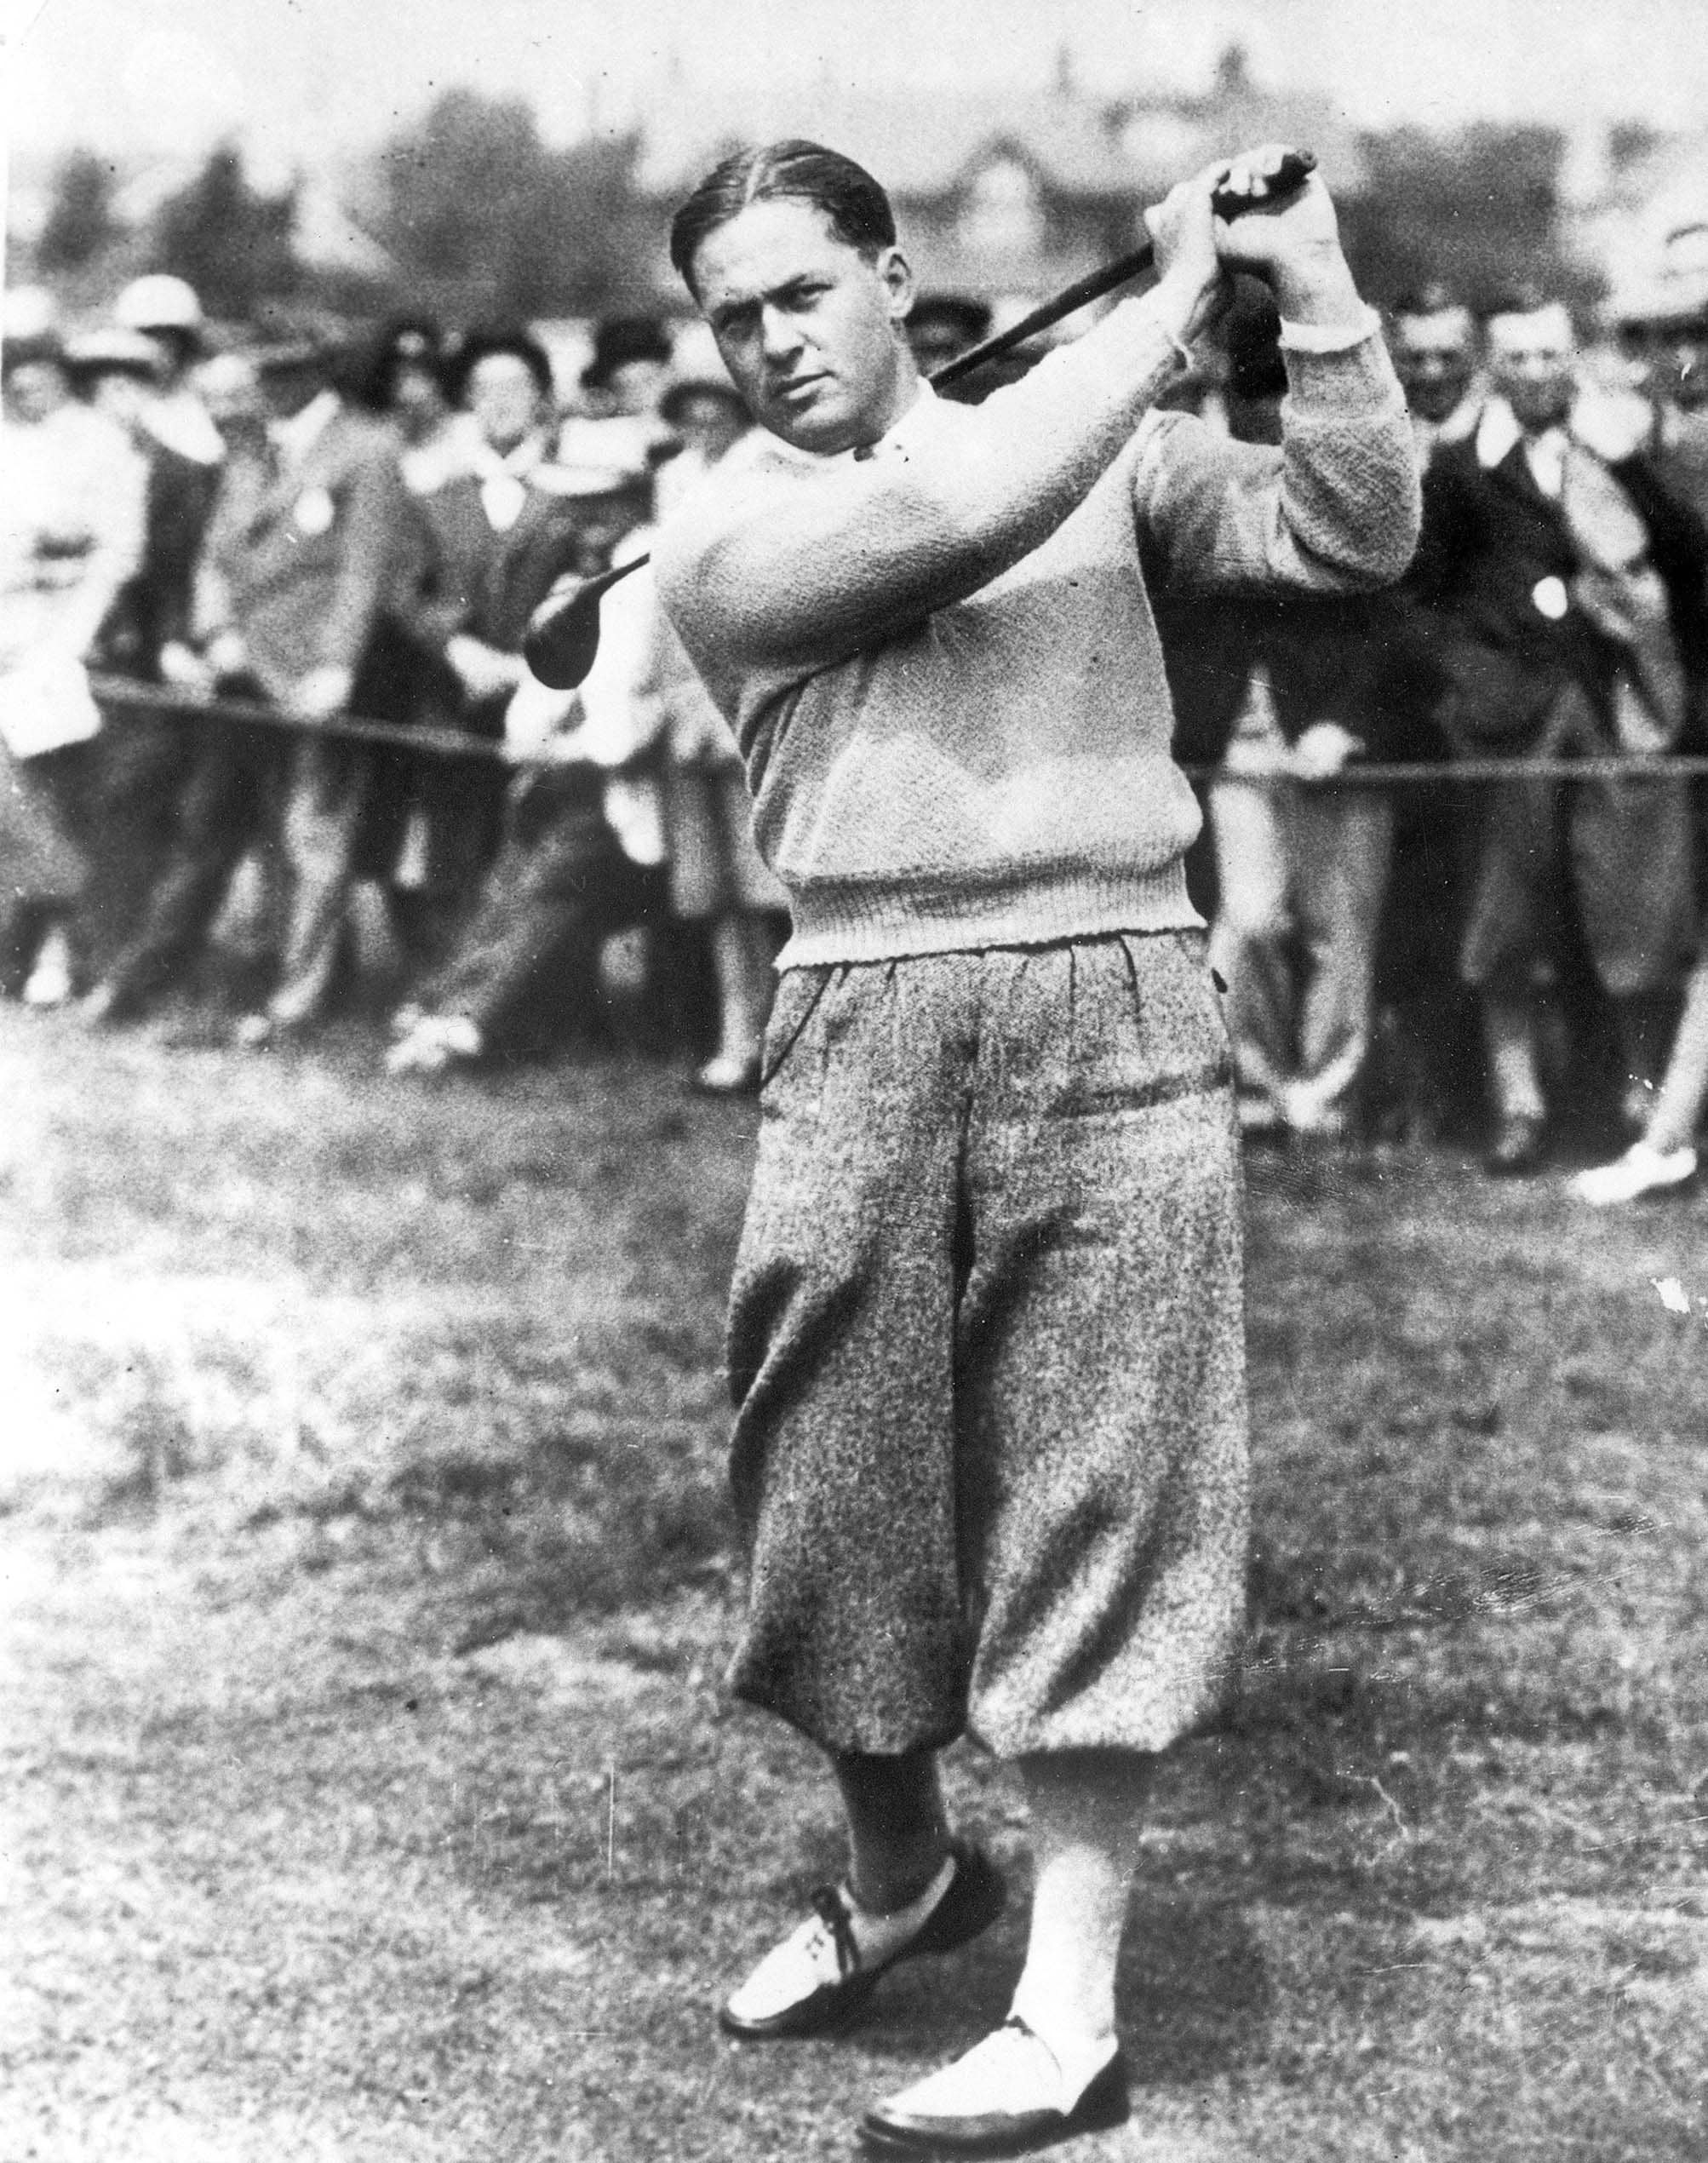 1930: Bobby Jones